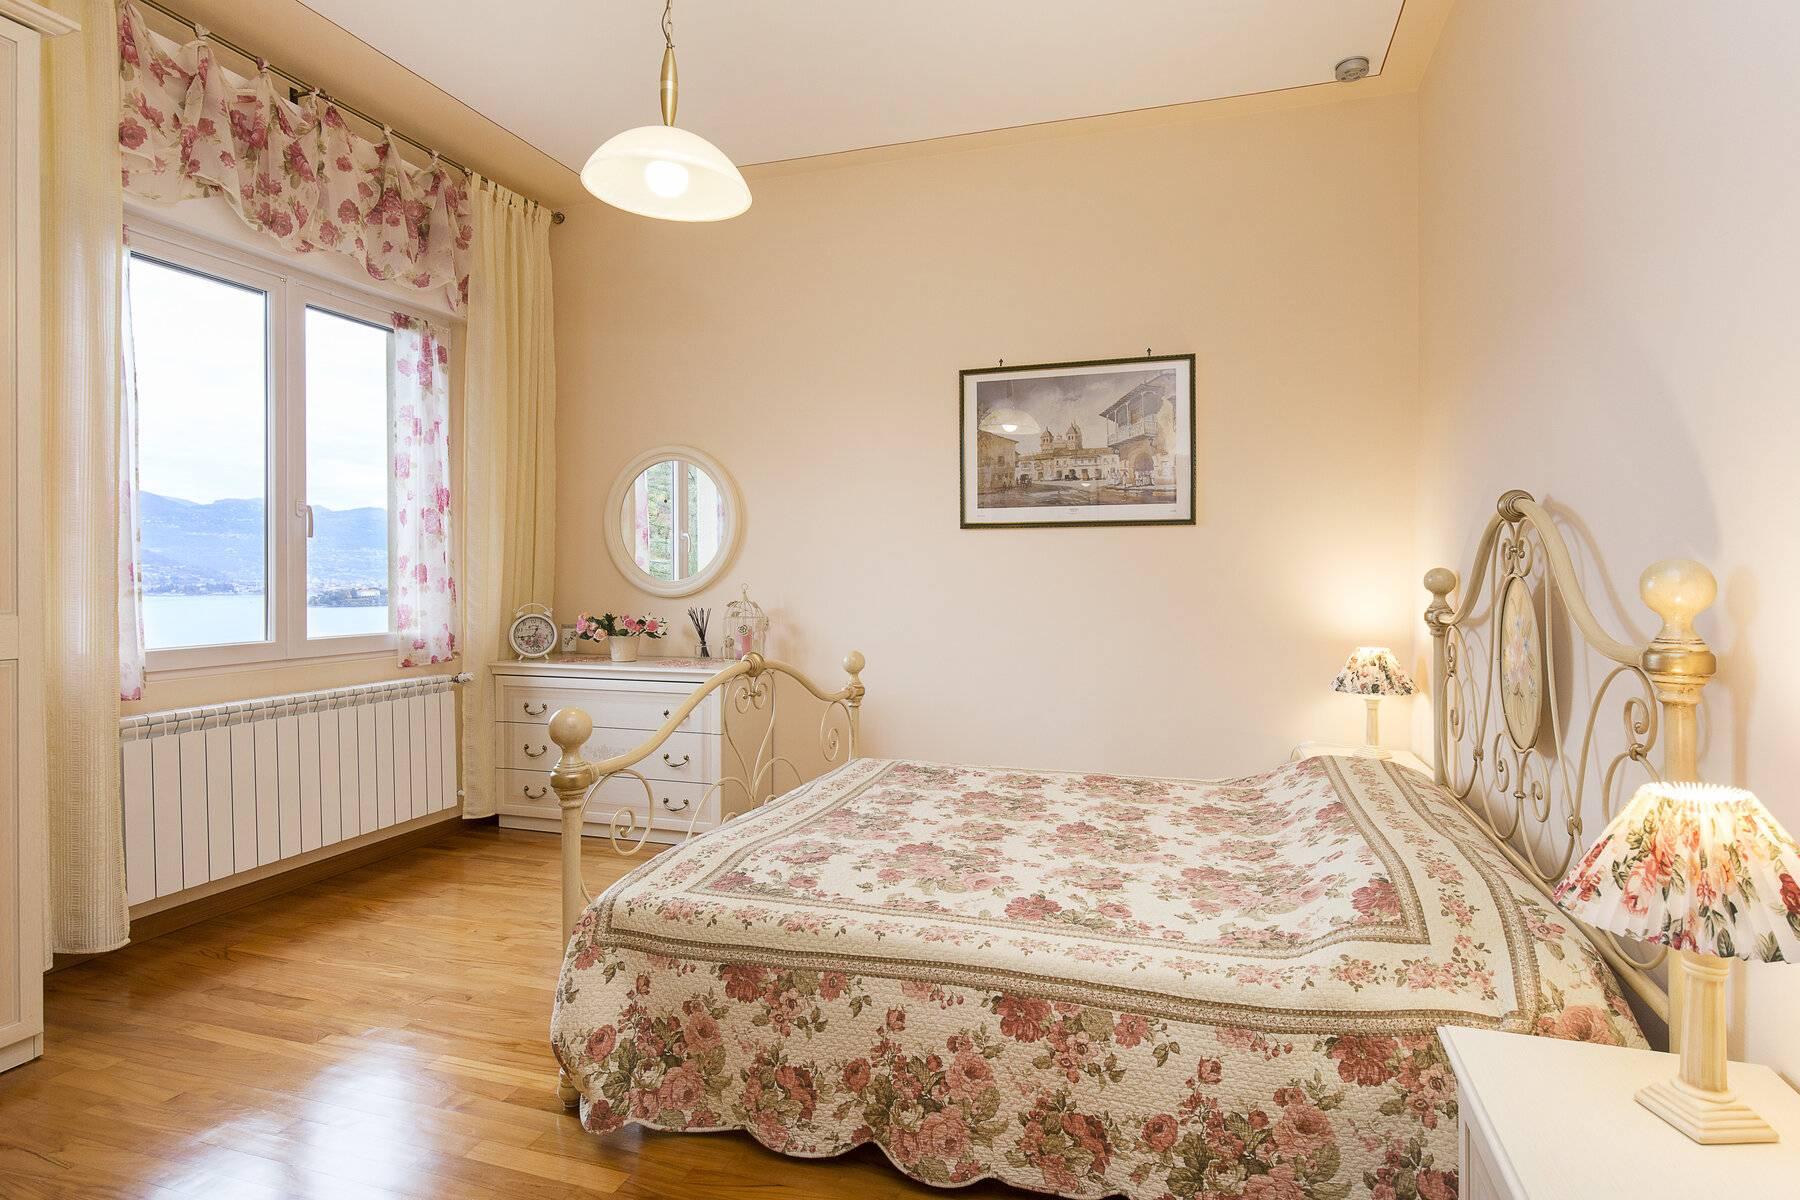 Villa in Vendita a Stresa: 5 locali, 364 mq - Foto 20